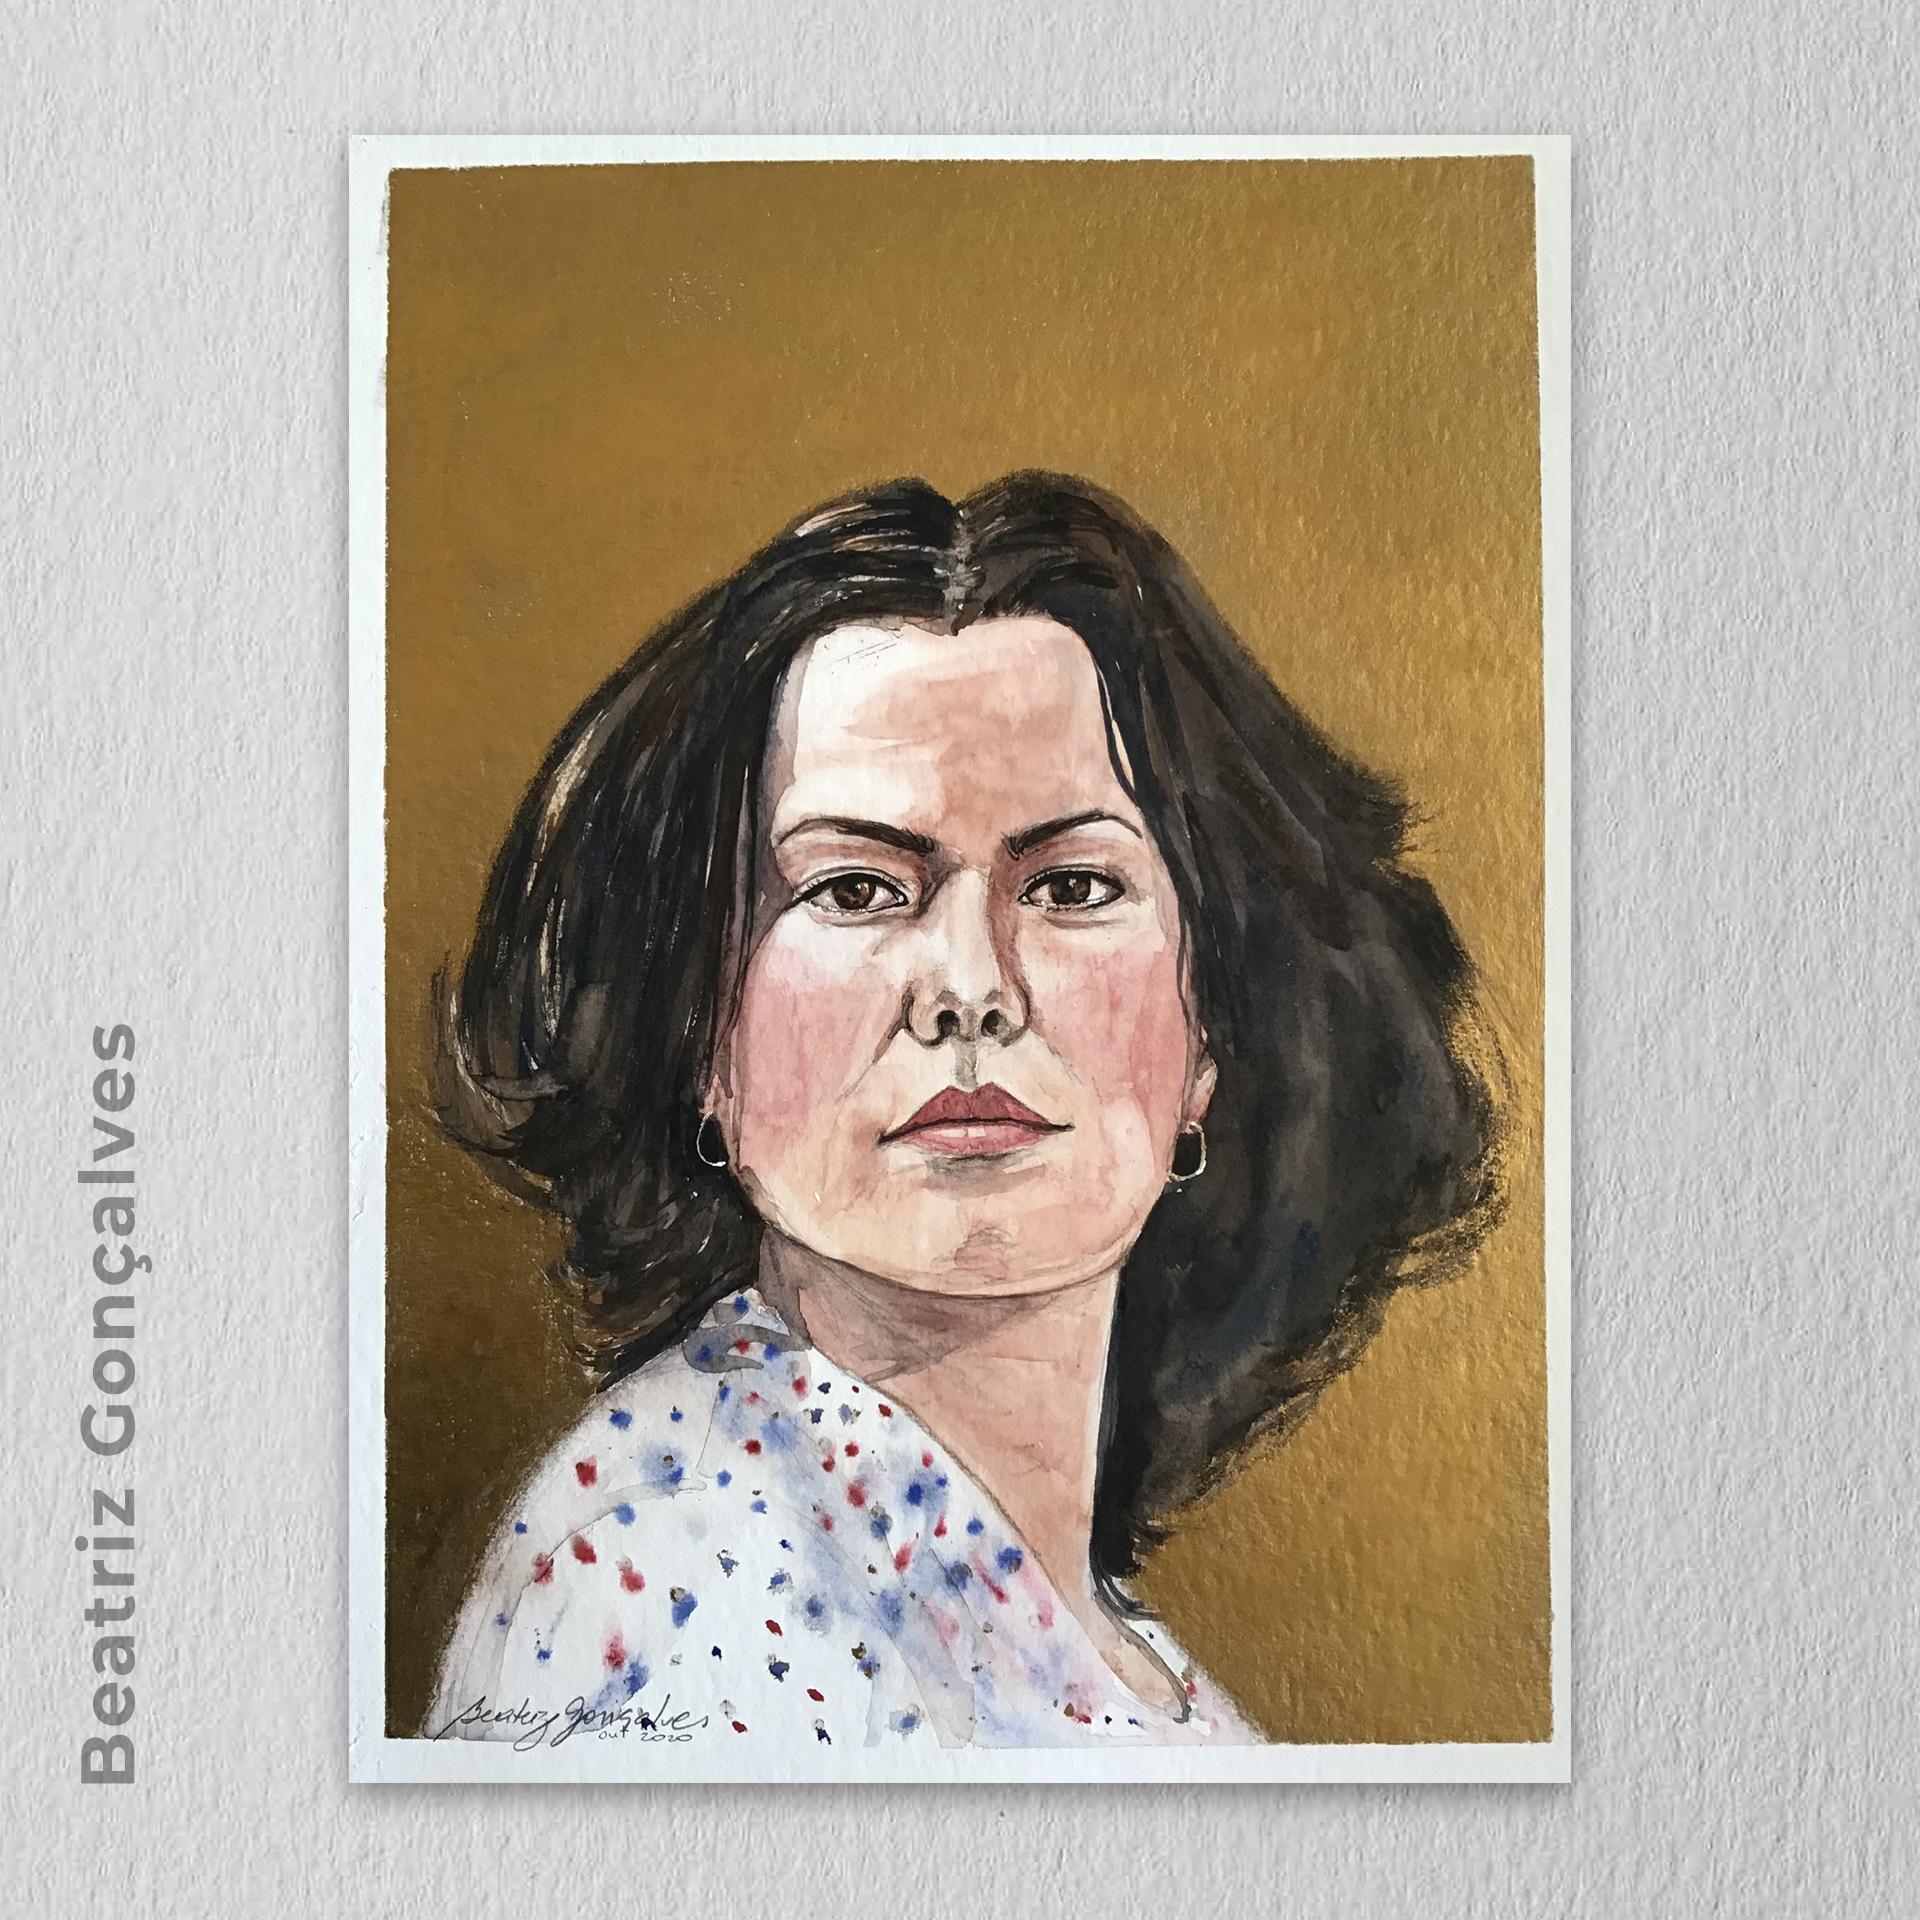 Artista: Beatriz Gonçalves - Título: Elis  24cm x 32cm - Técnica mista: aquarela e pasta metálica - R$ 250,00